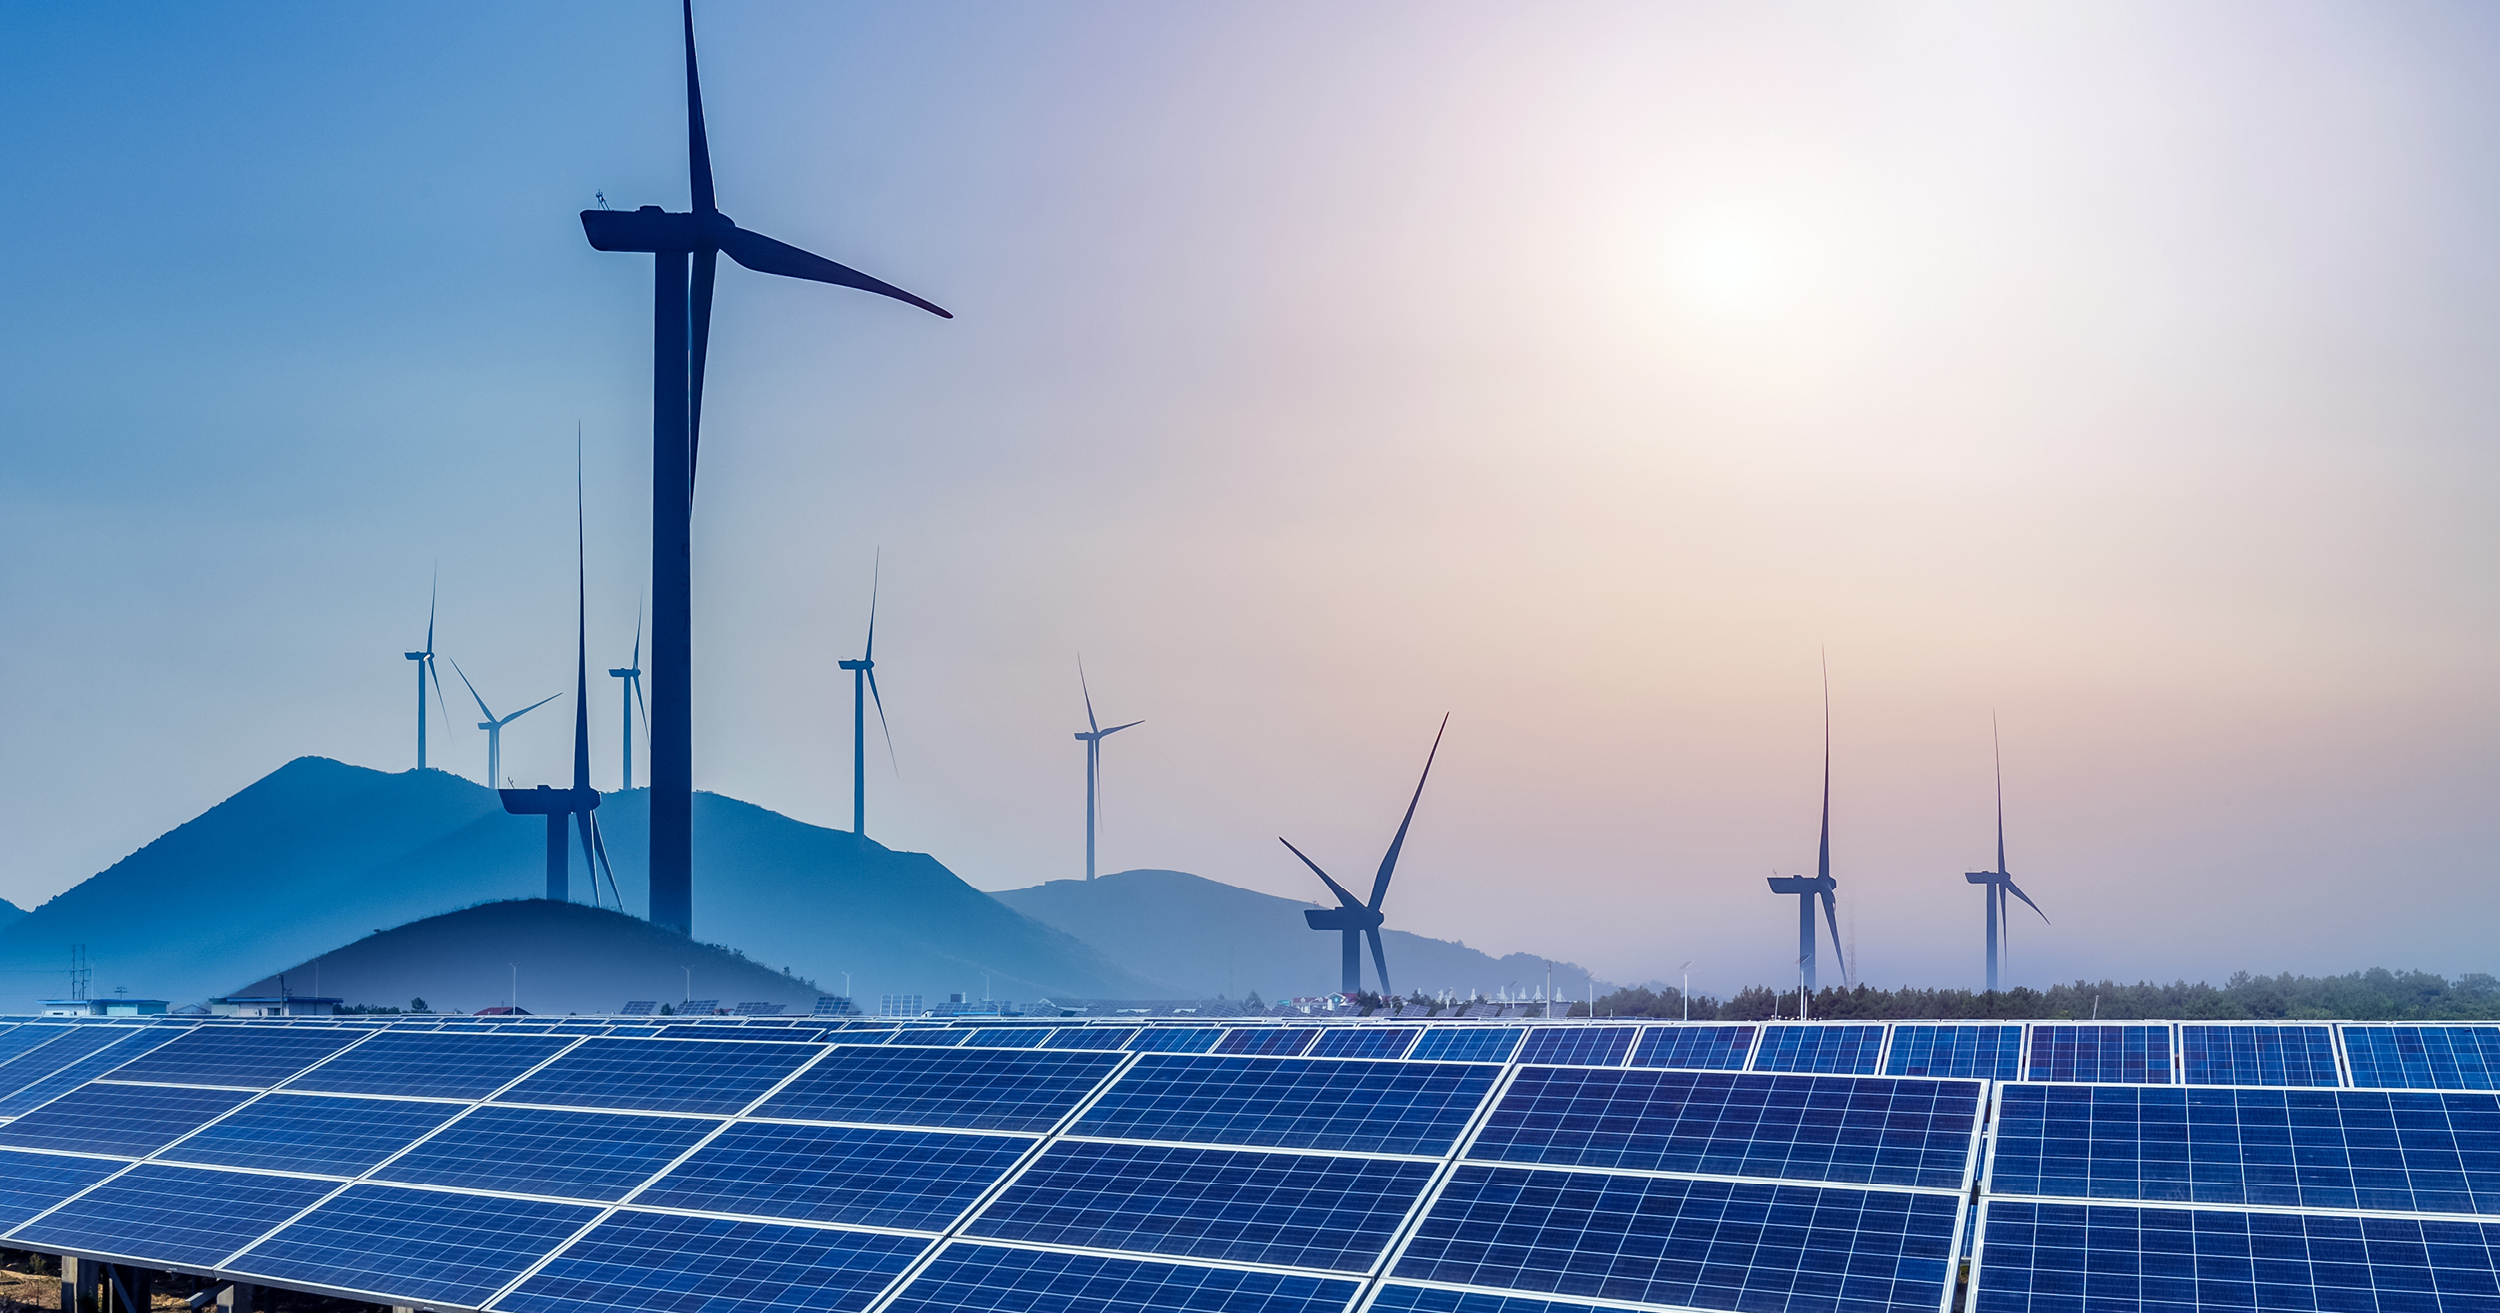 Renewable Energy - Solar and Wind Power